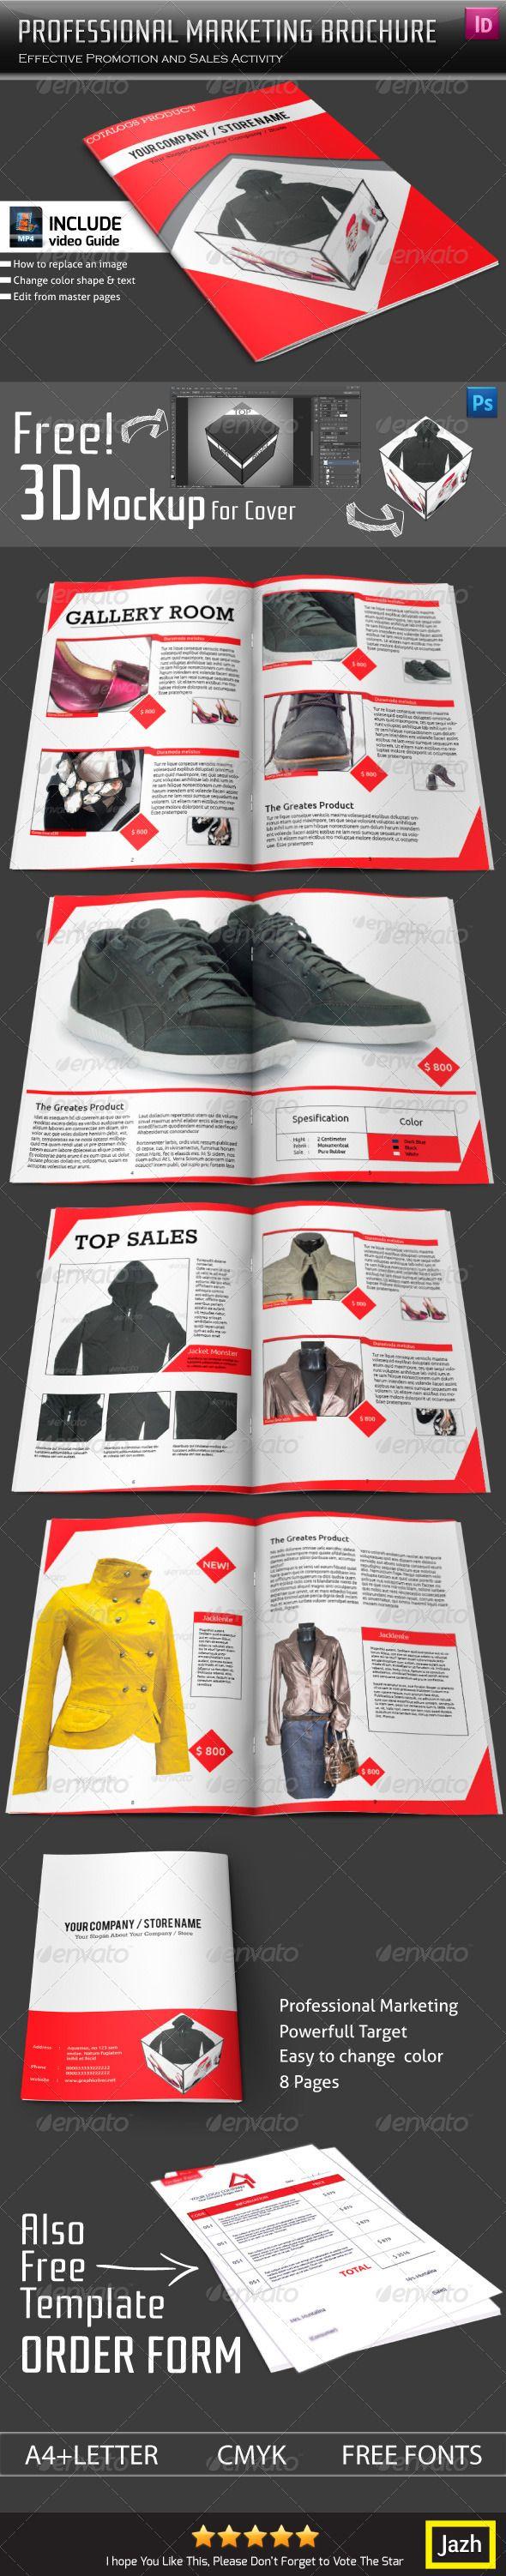 Professional Marketing Brochure  Catalogs Brochures